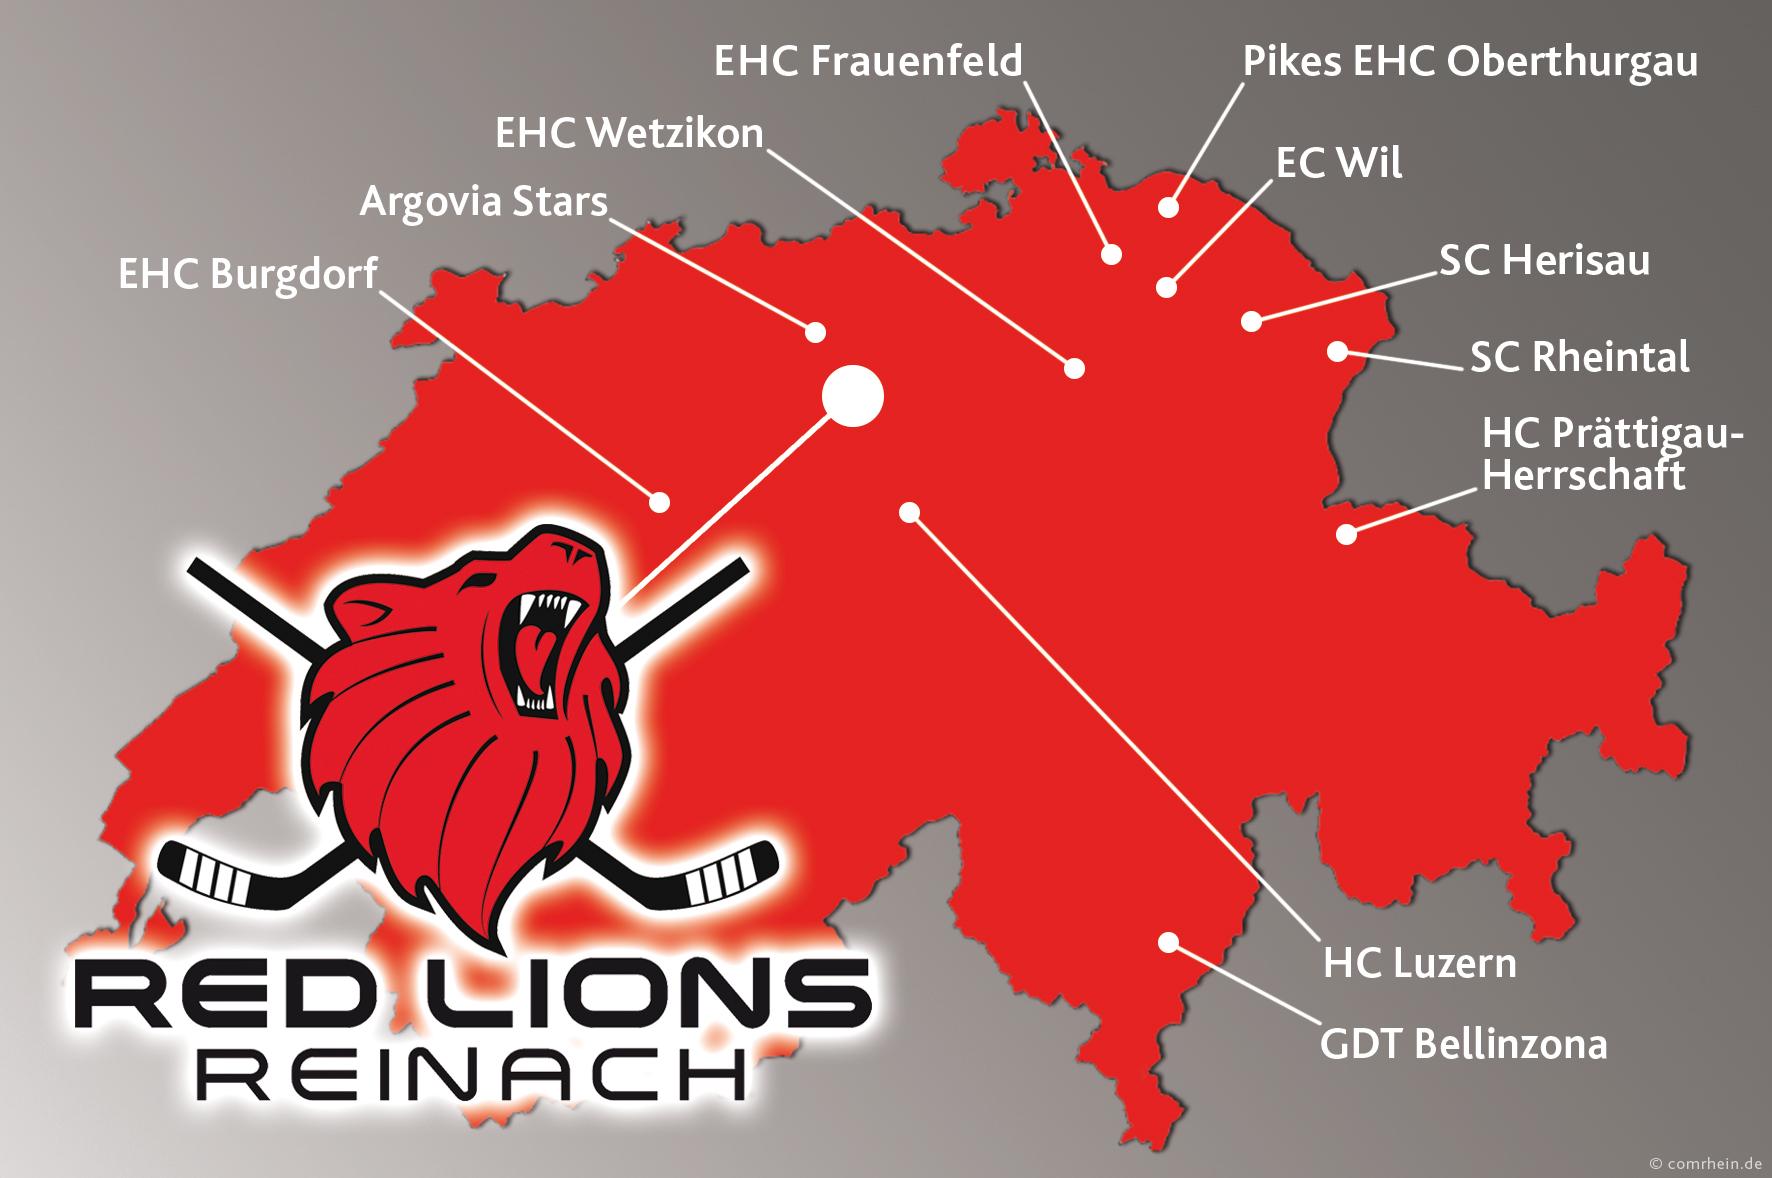 Red Lions Reinach, Saison 2019/20